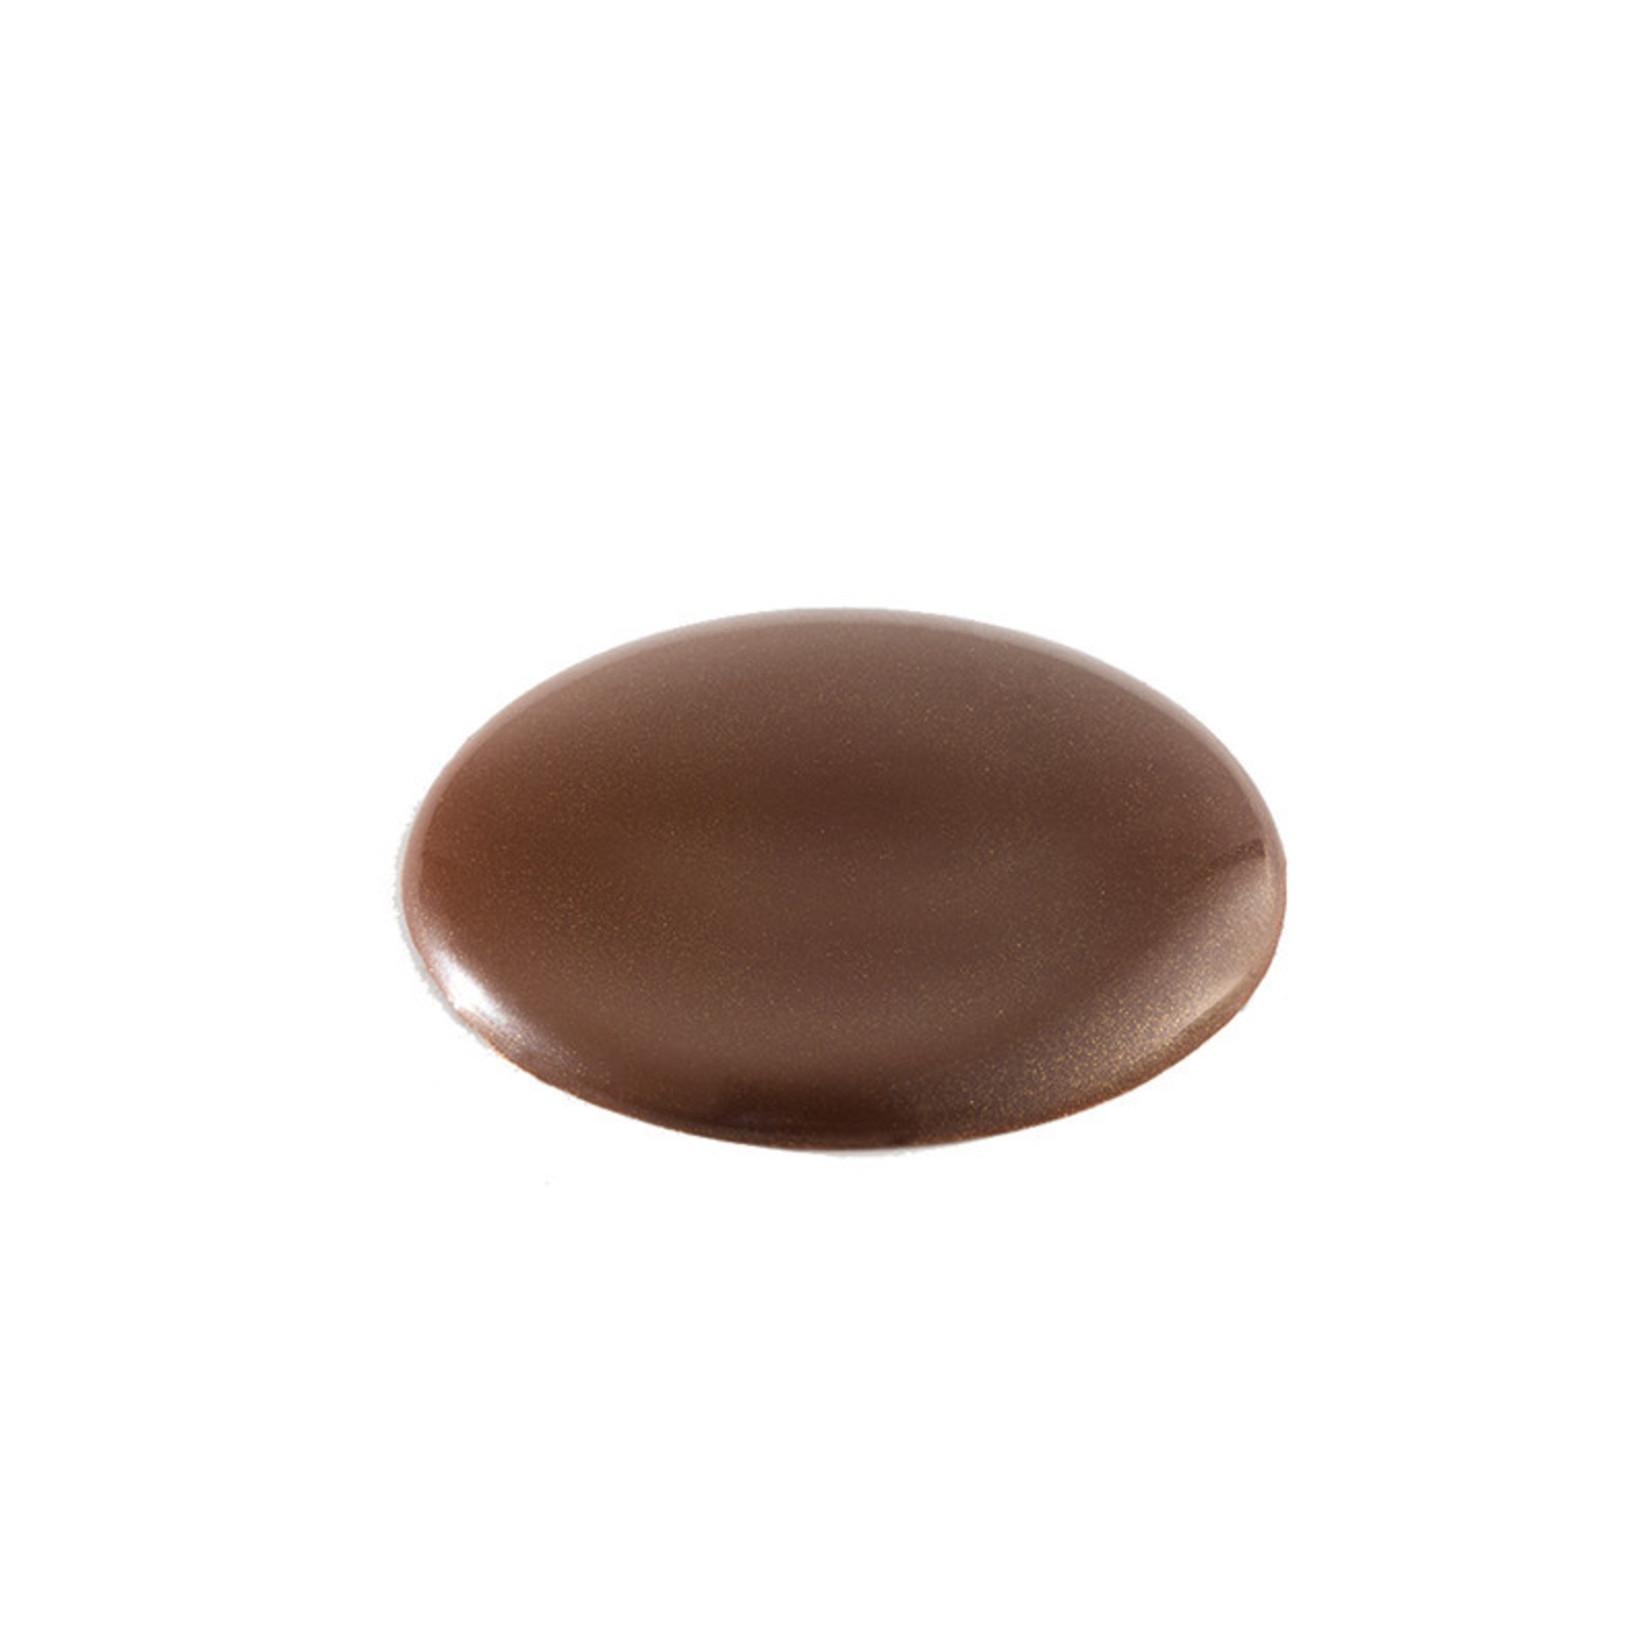 Cacao Barry Cacao Barry - Tritan Chocolate Mold - Elegant Pistoles (15 cavity), MLD-090534-M00